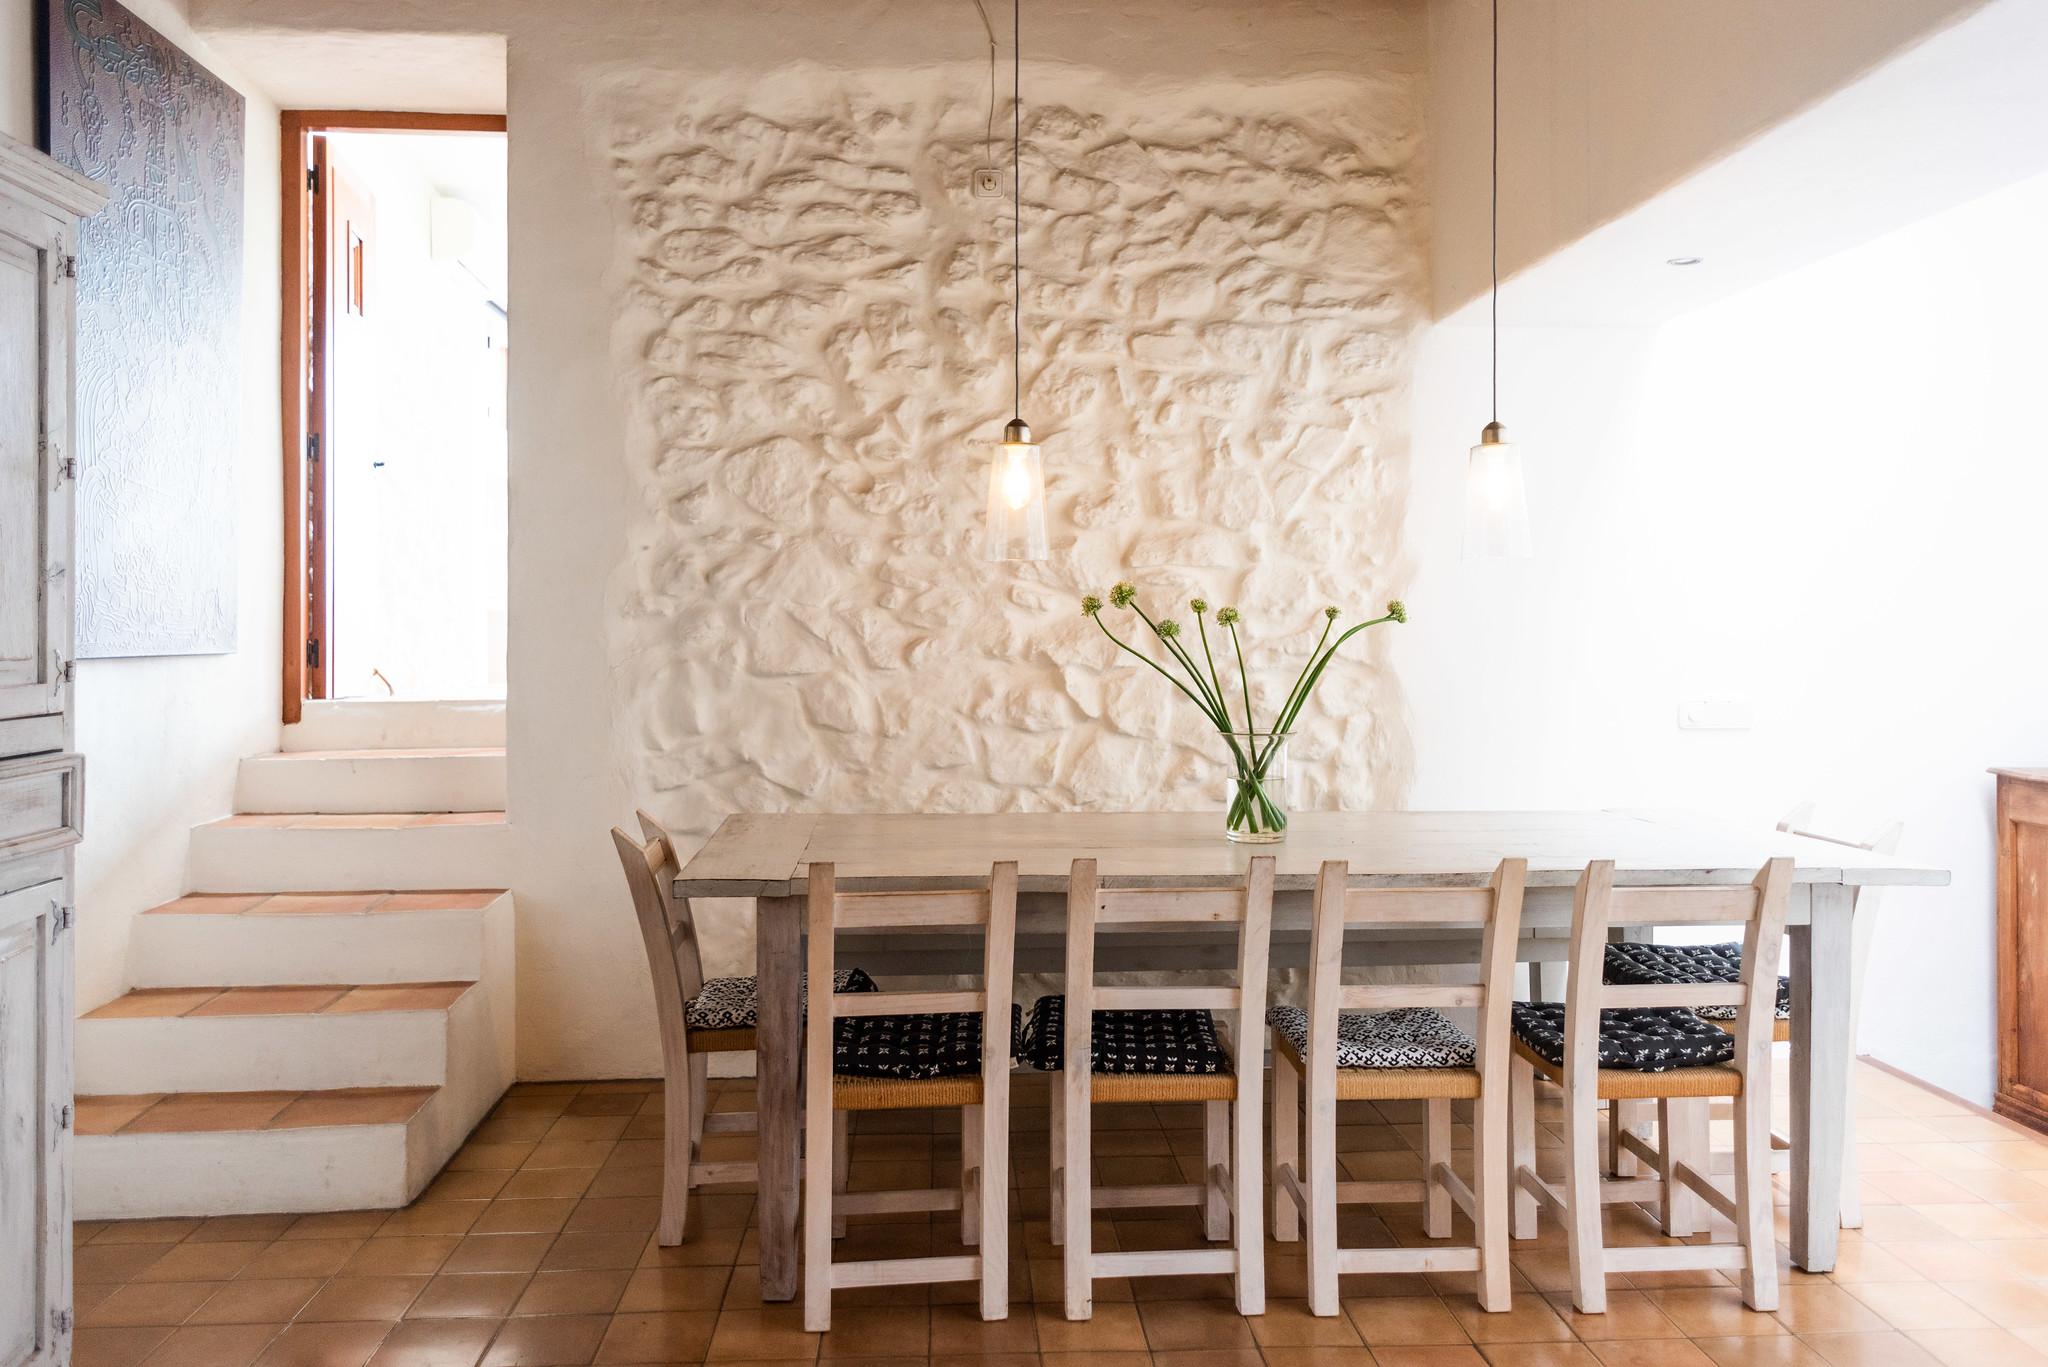 https://www.white-ibiza.com/wp-content/uploads/2020/05/white-ibiza-villas-can-lyra-breakfast.jpg